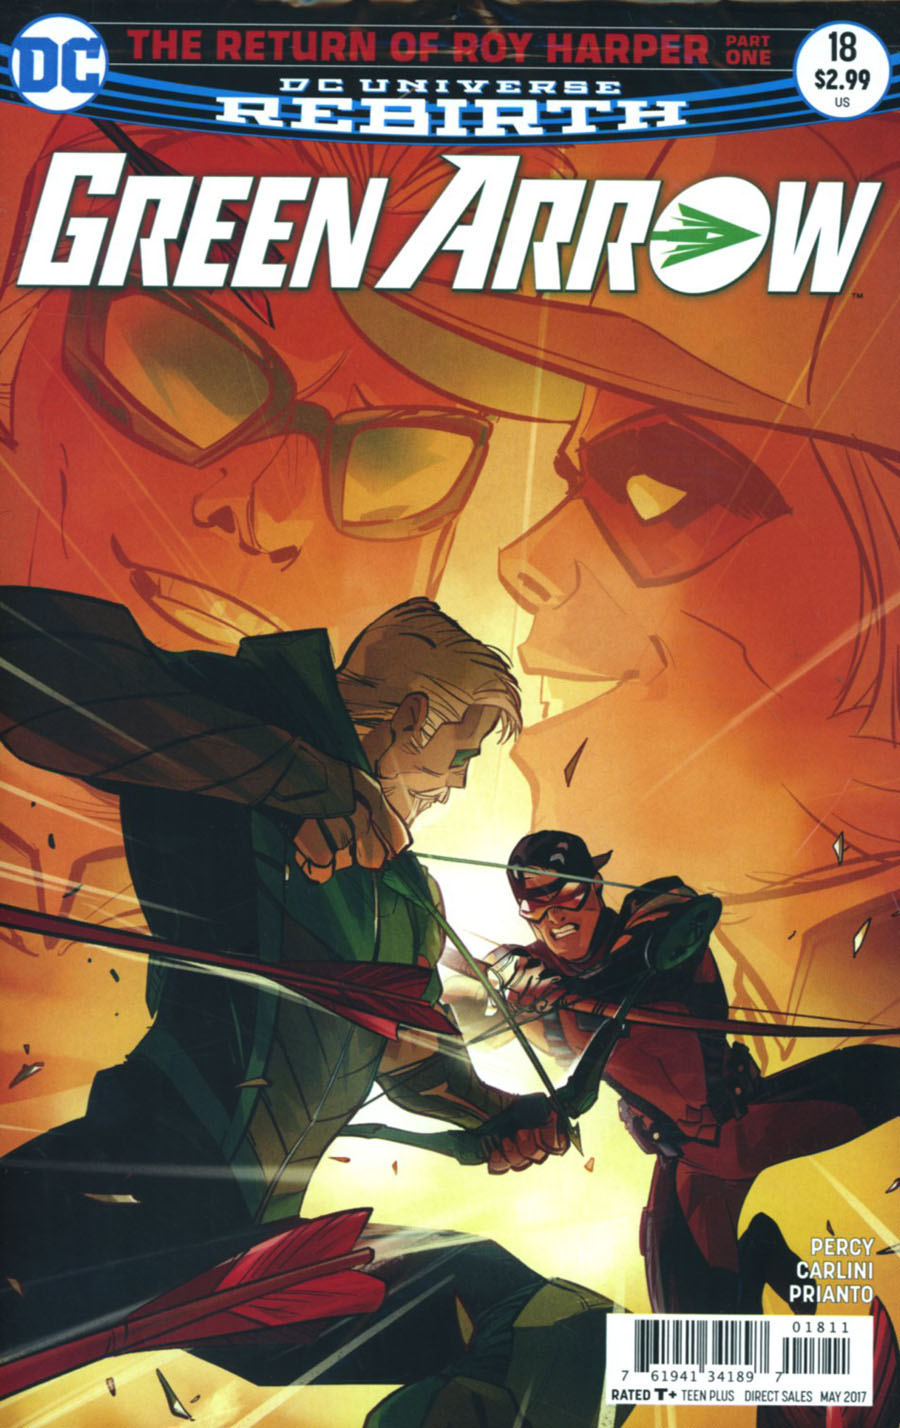 Green Arrow Vol 7 #18 Cover A Regular Otto Schmidt Cover With Polybag